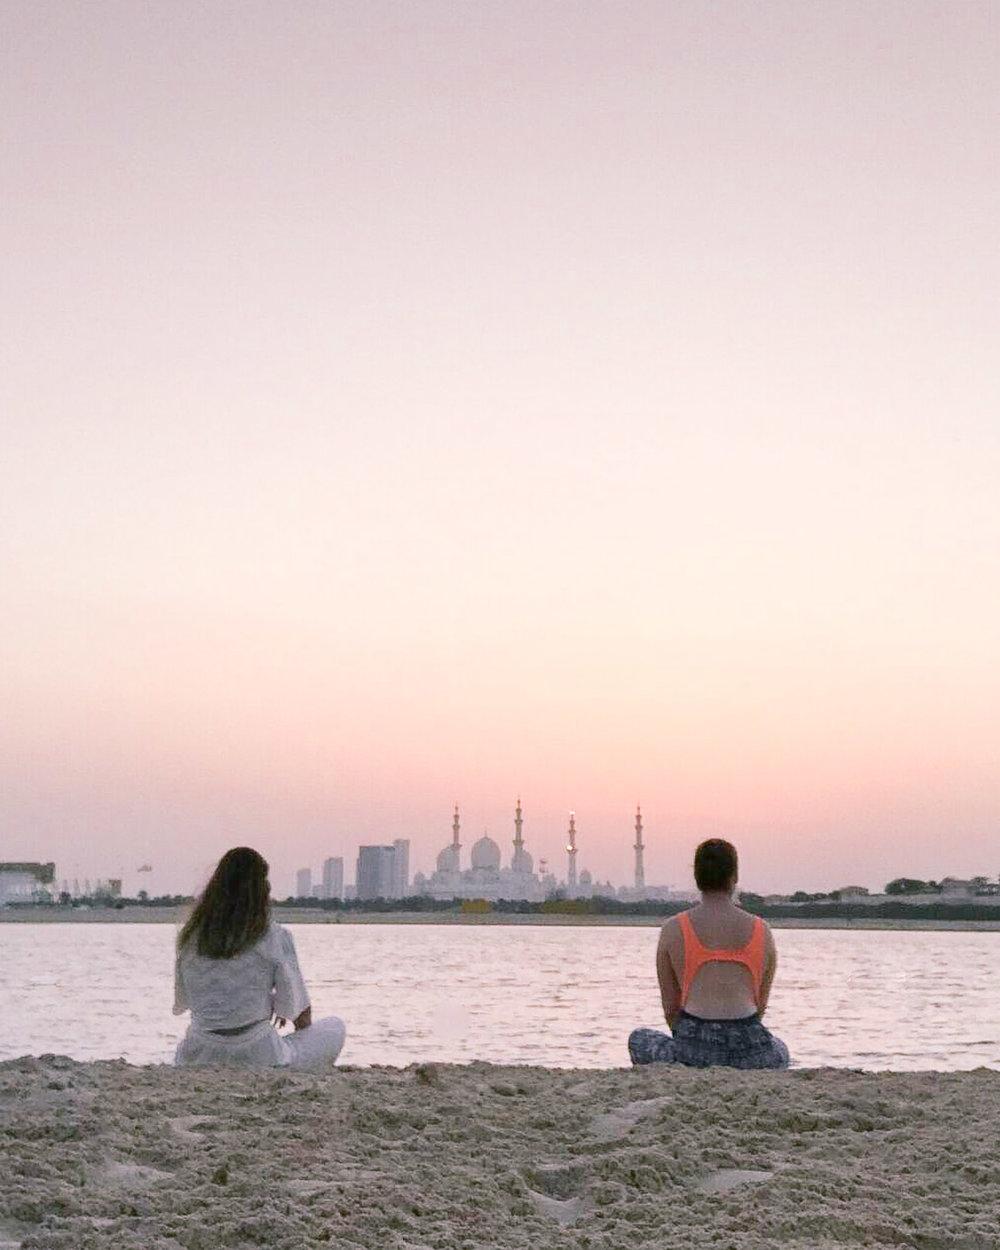 The UAE - The Adventure Decade